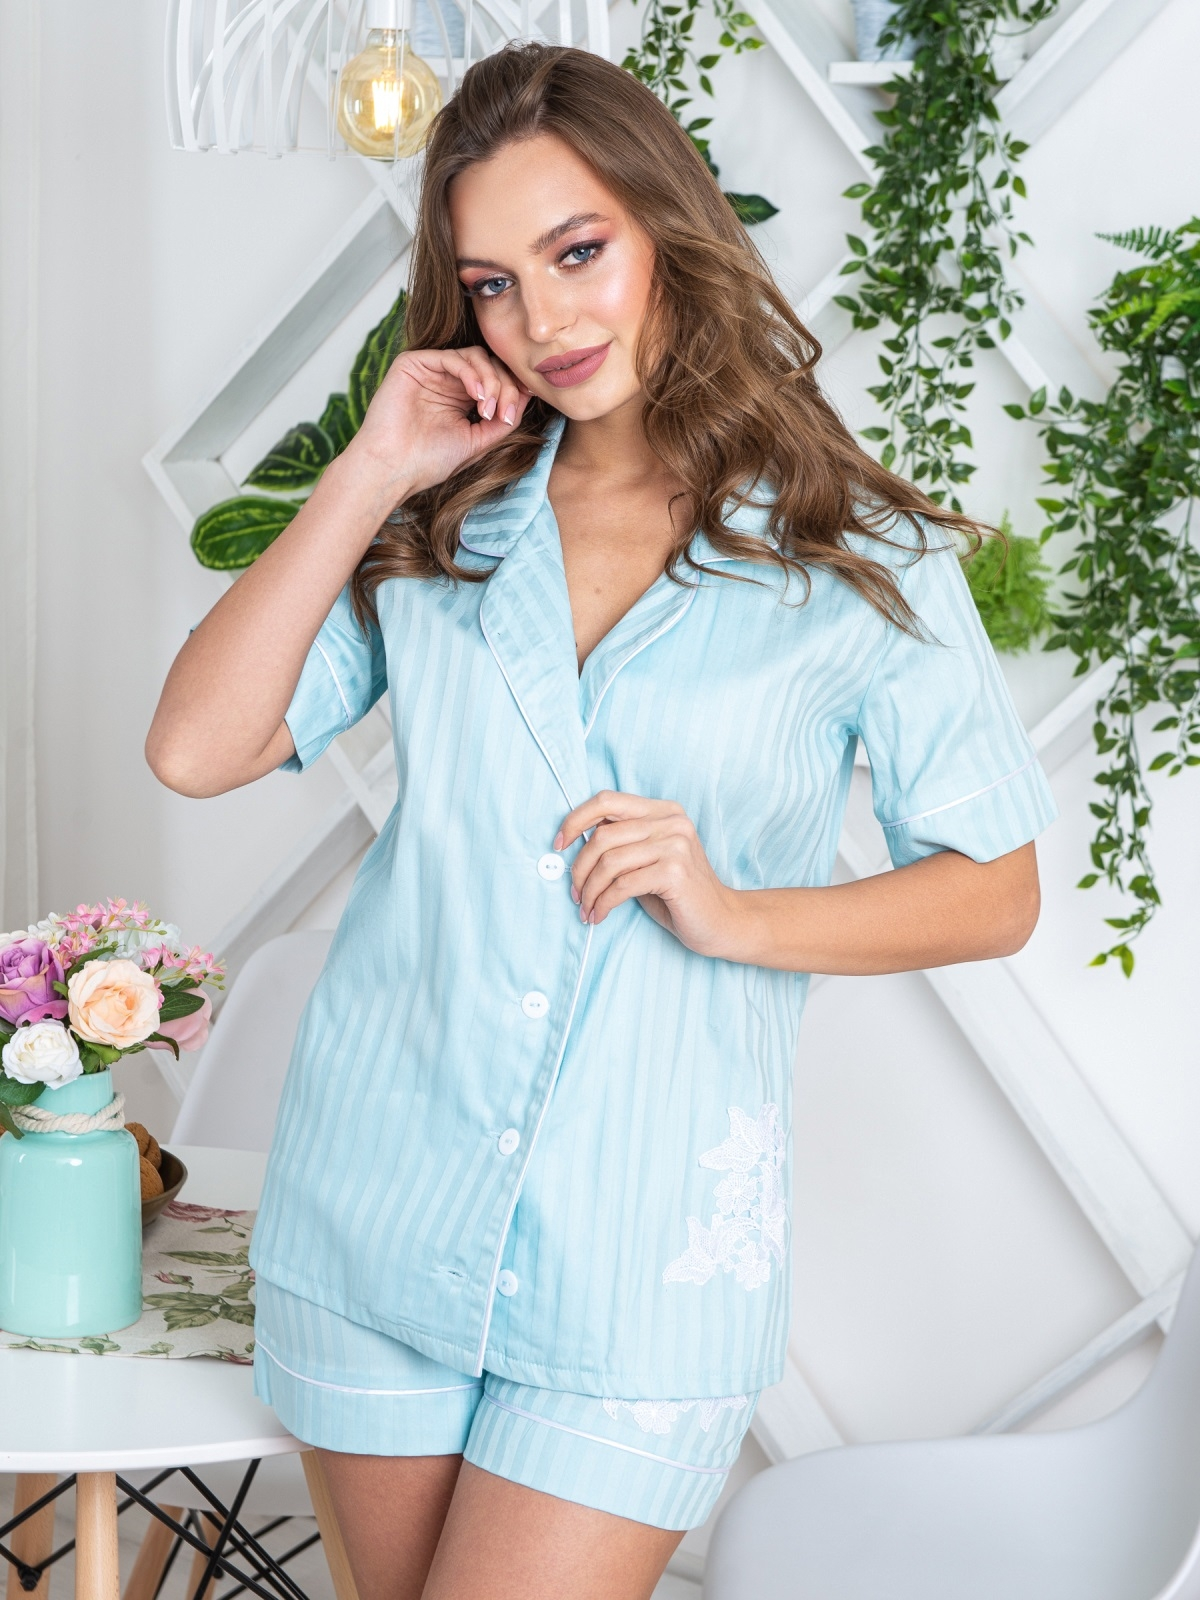 Голубая пижама с нашивкой на топе и шортах - 20450, фото 1 – интернет-магазин Dressa